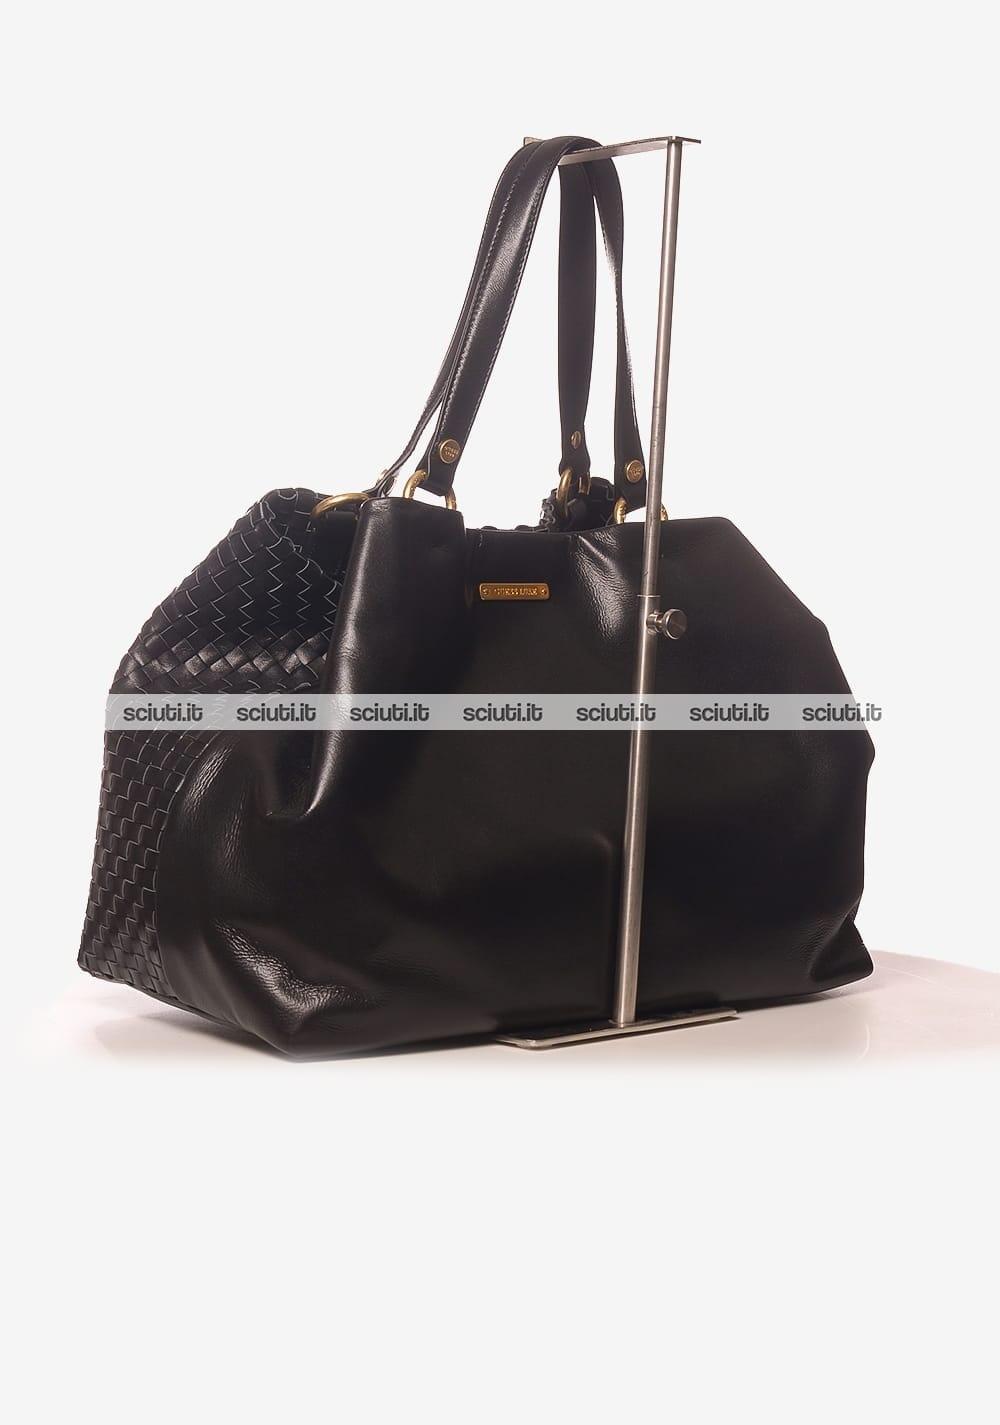 Donna Borsa Shopping Lola Pelle Grande Intrecciata Guess Luxe In P14nHq1Z